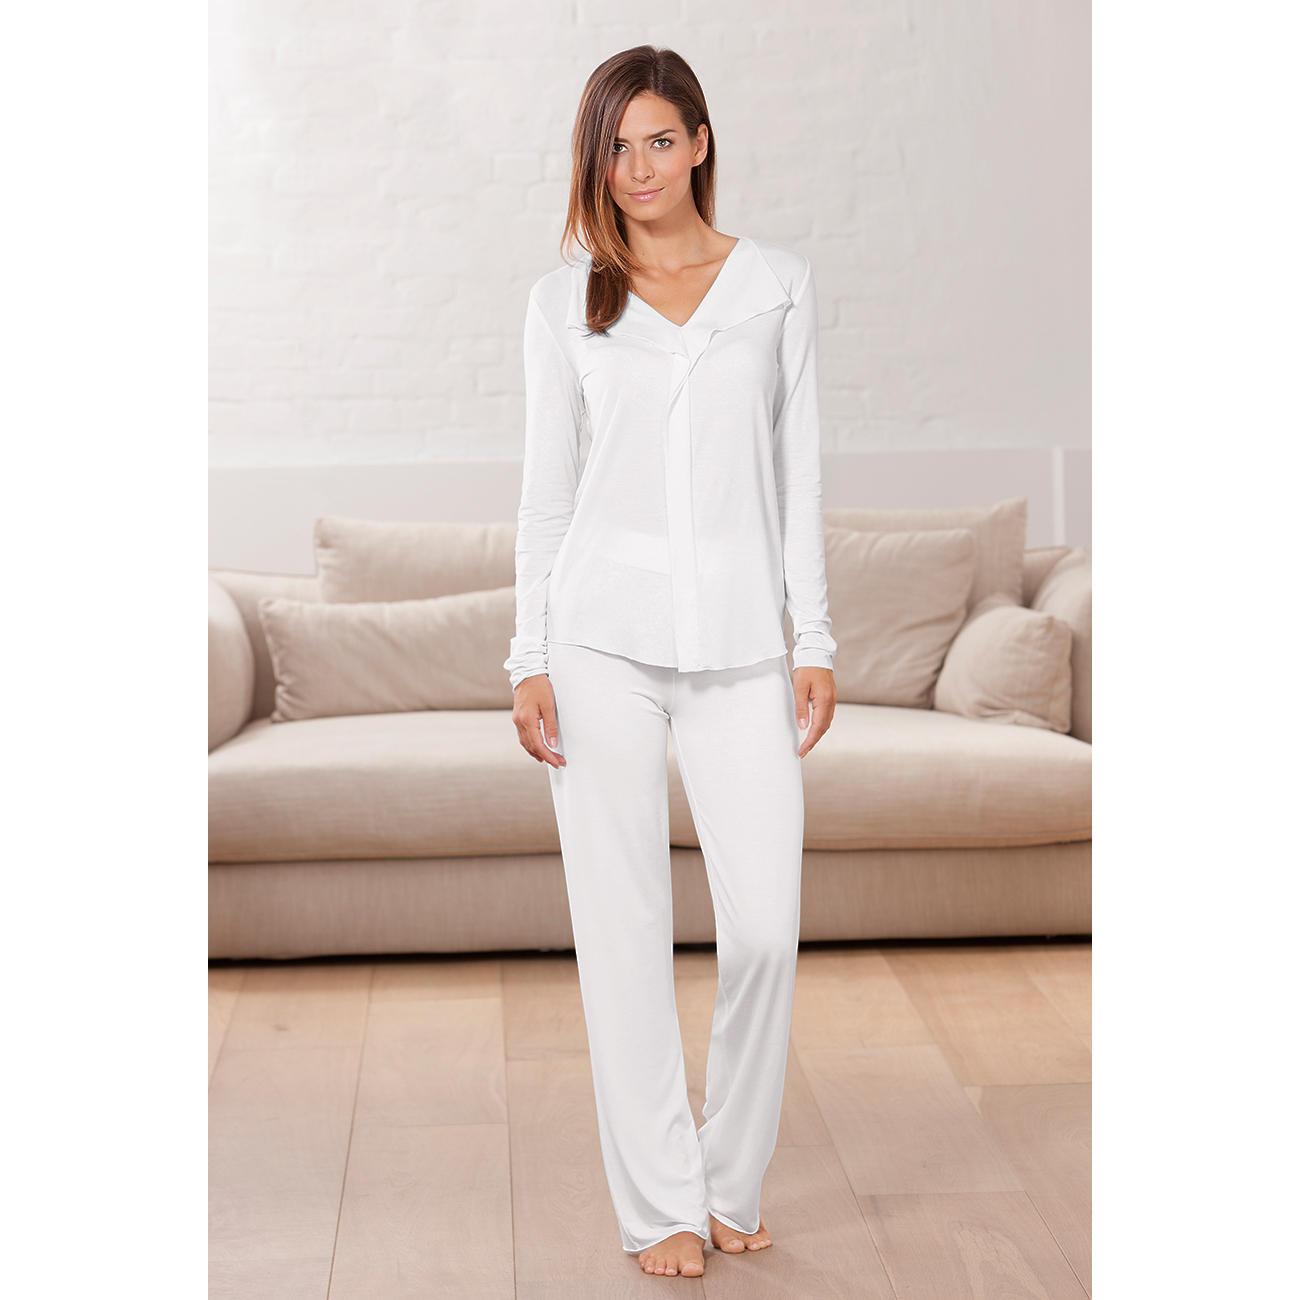 micromodal couture pyjama 3 jahre garantie pro idee. Black Bedroom Furniture Sets. Home Design Ideas